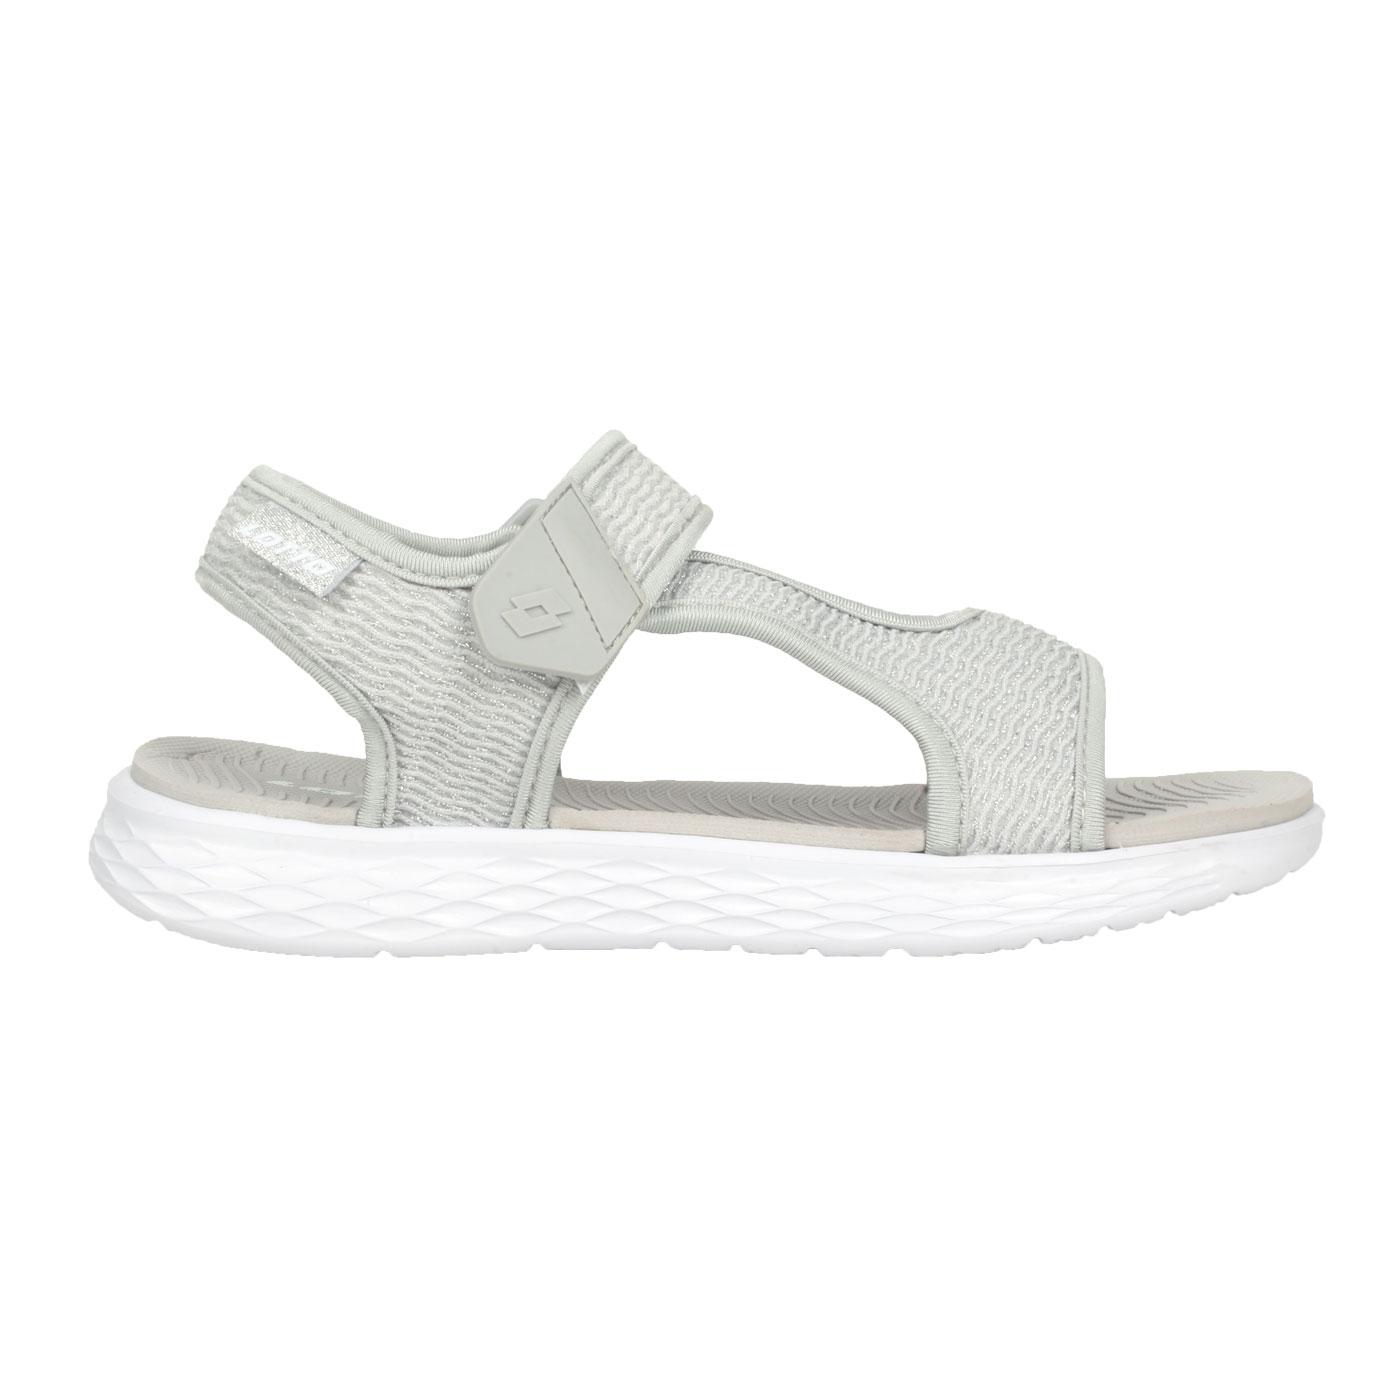 LOTTO 女款輕量涼鞋 LT1AWS3379 - 銀白